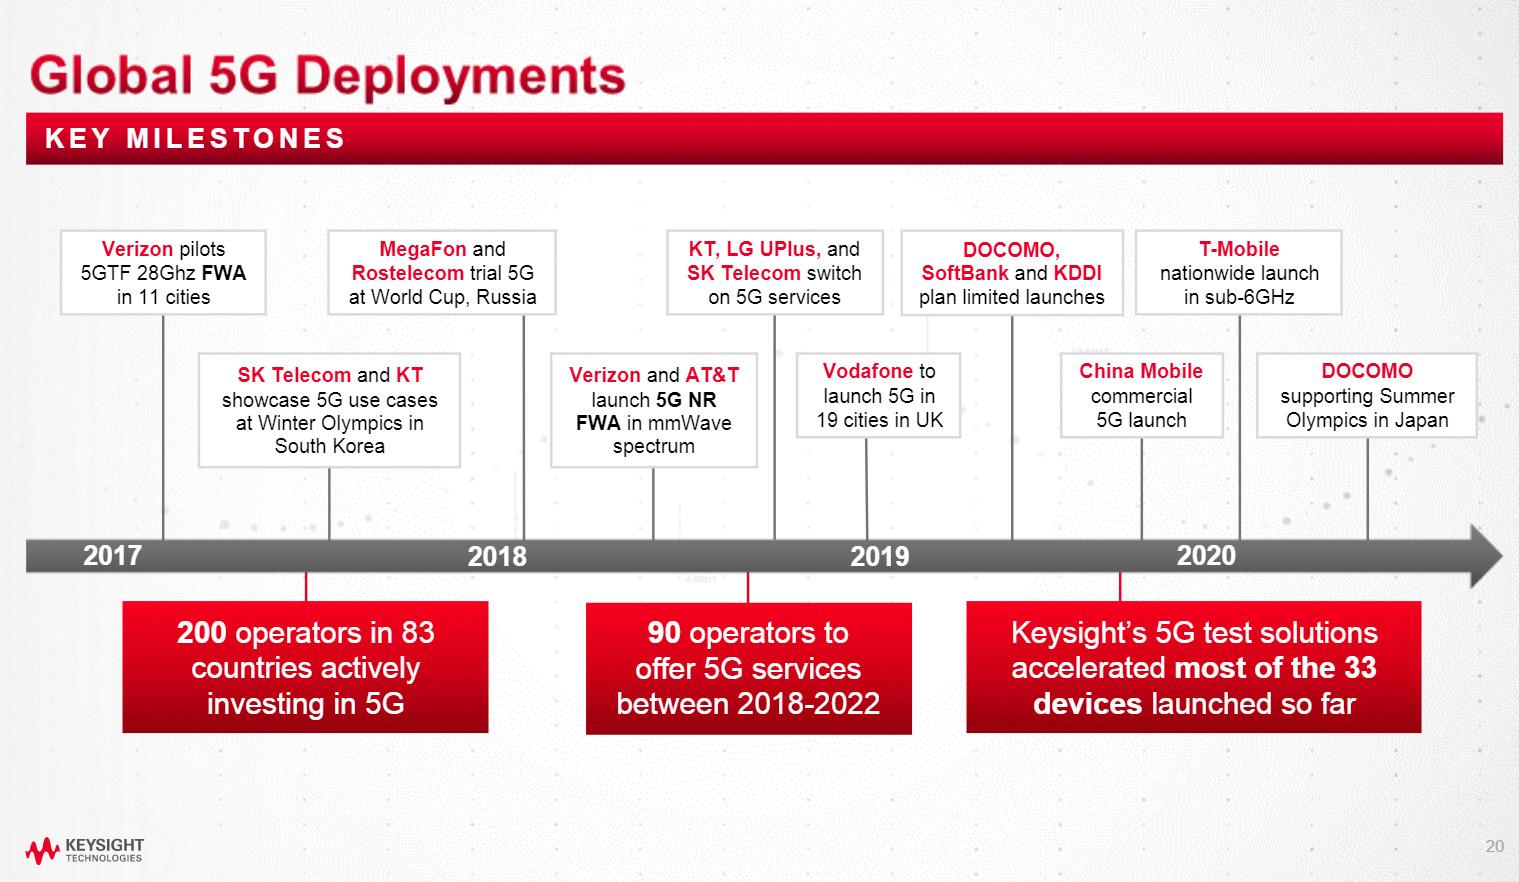 5G deployments